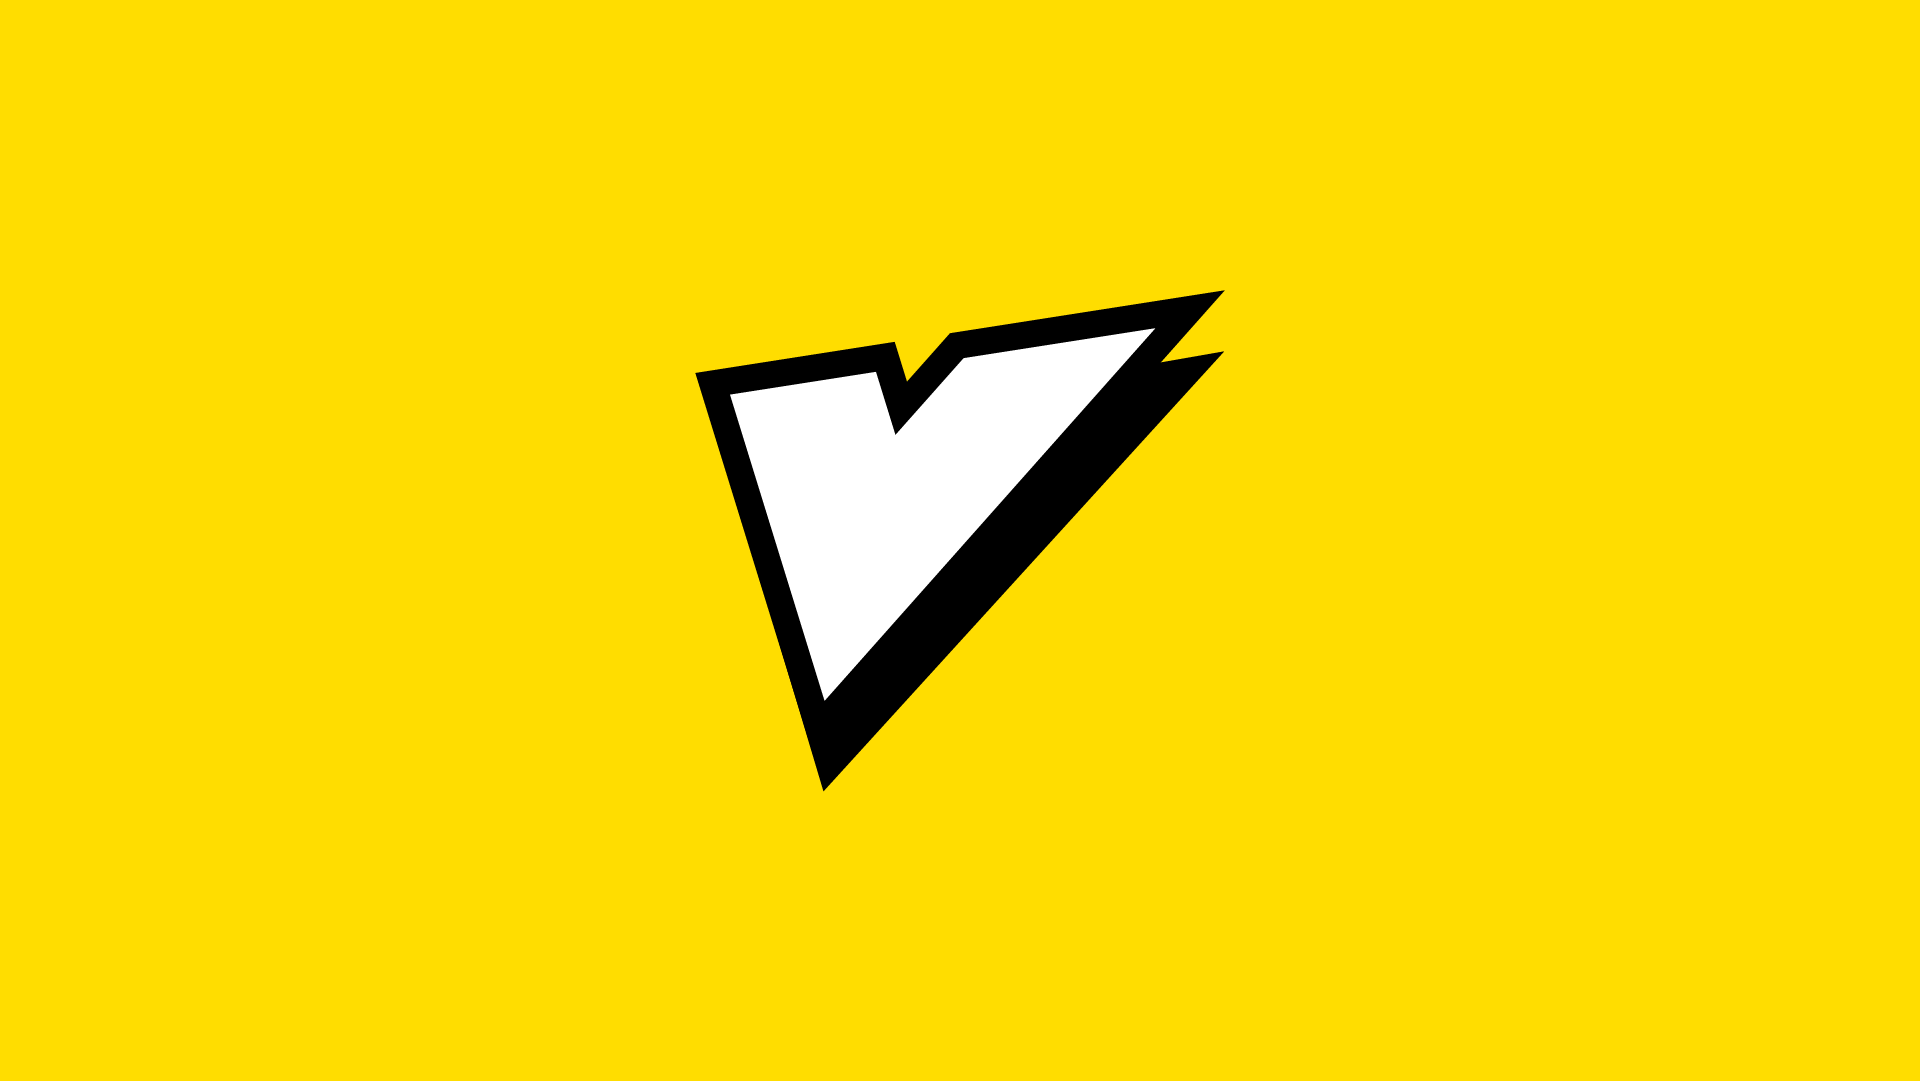 vrv_logos-03.png